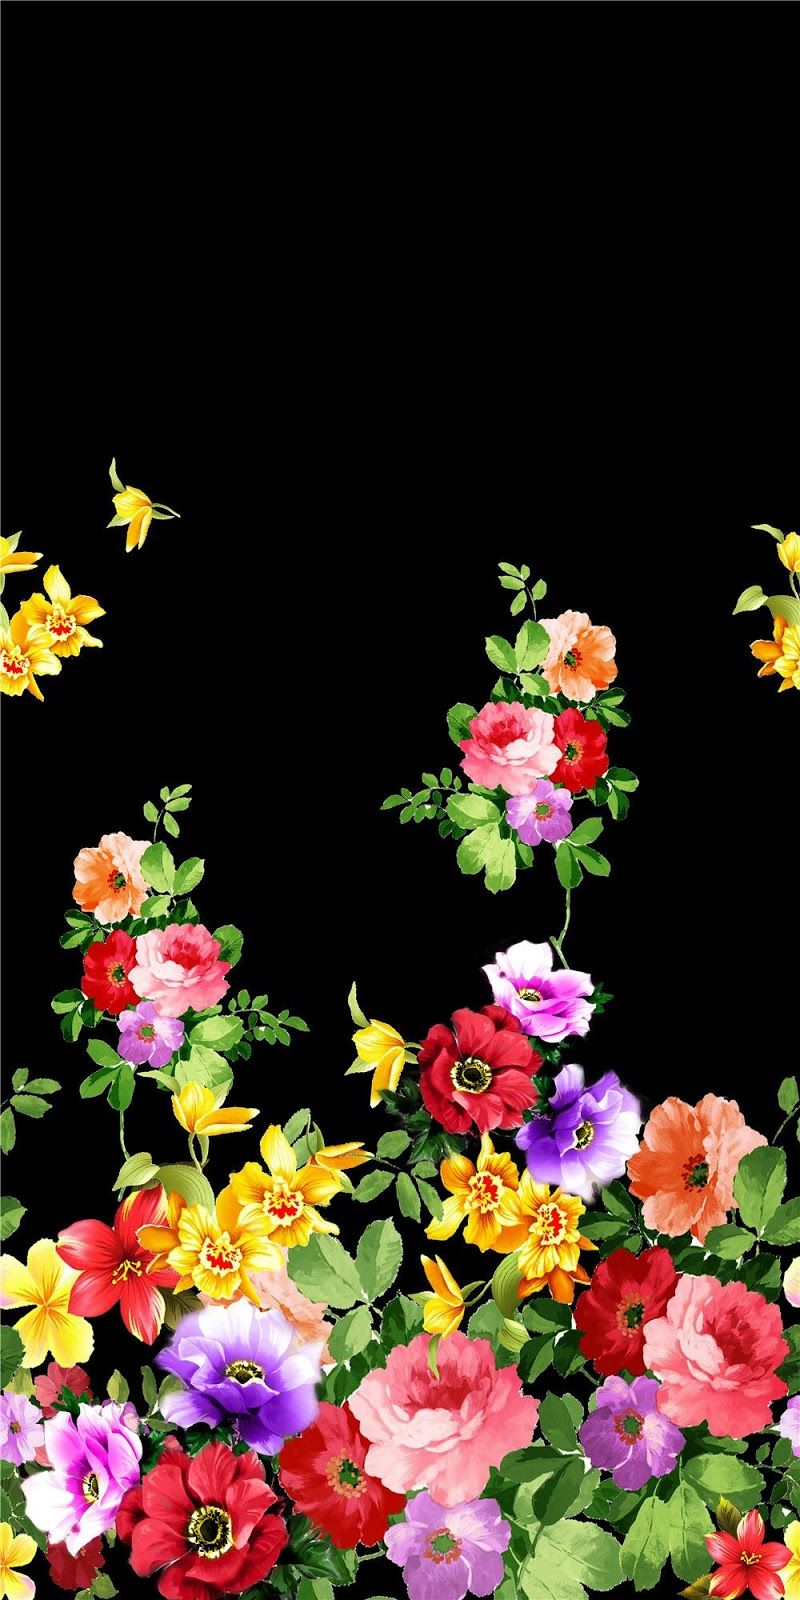 PAINTING_Flower Design_Digital Print_2